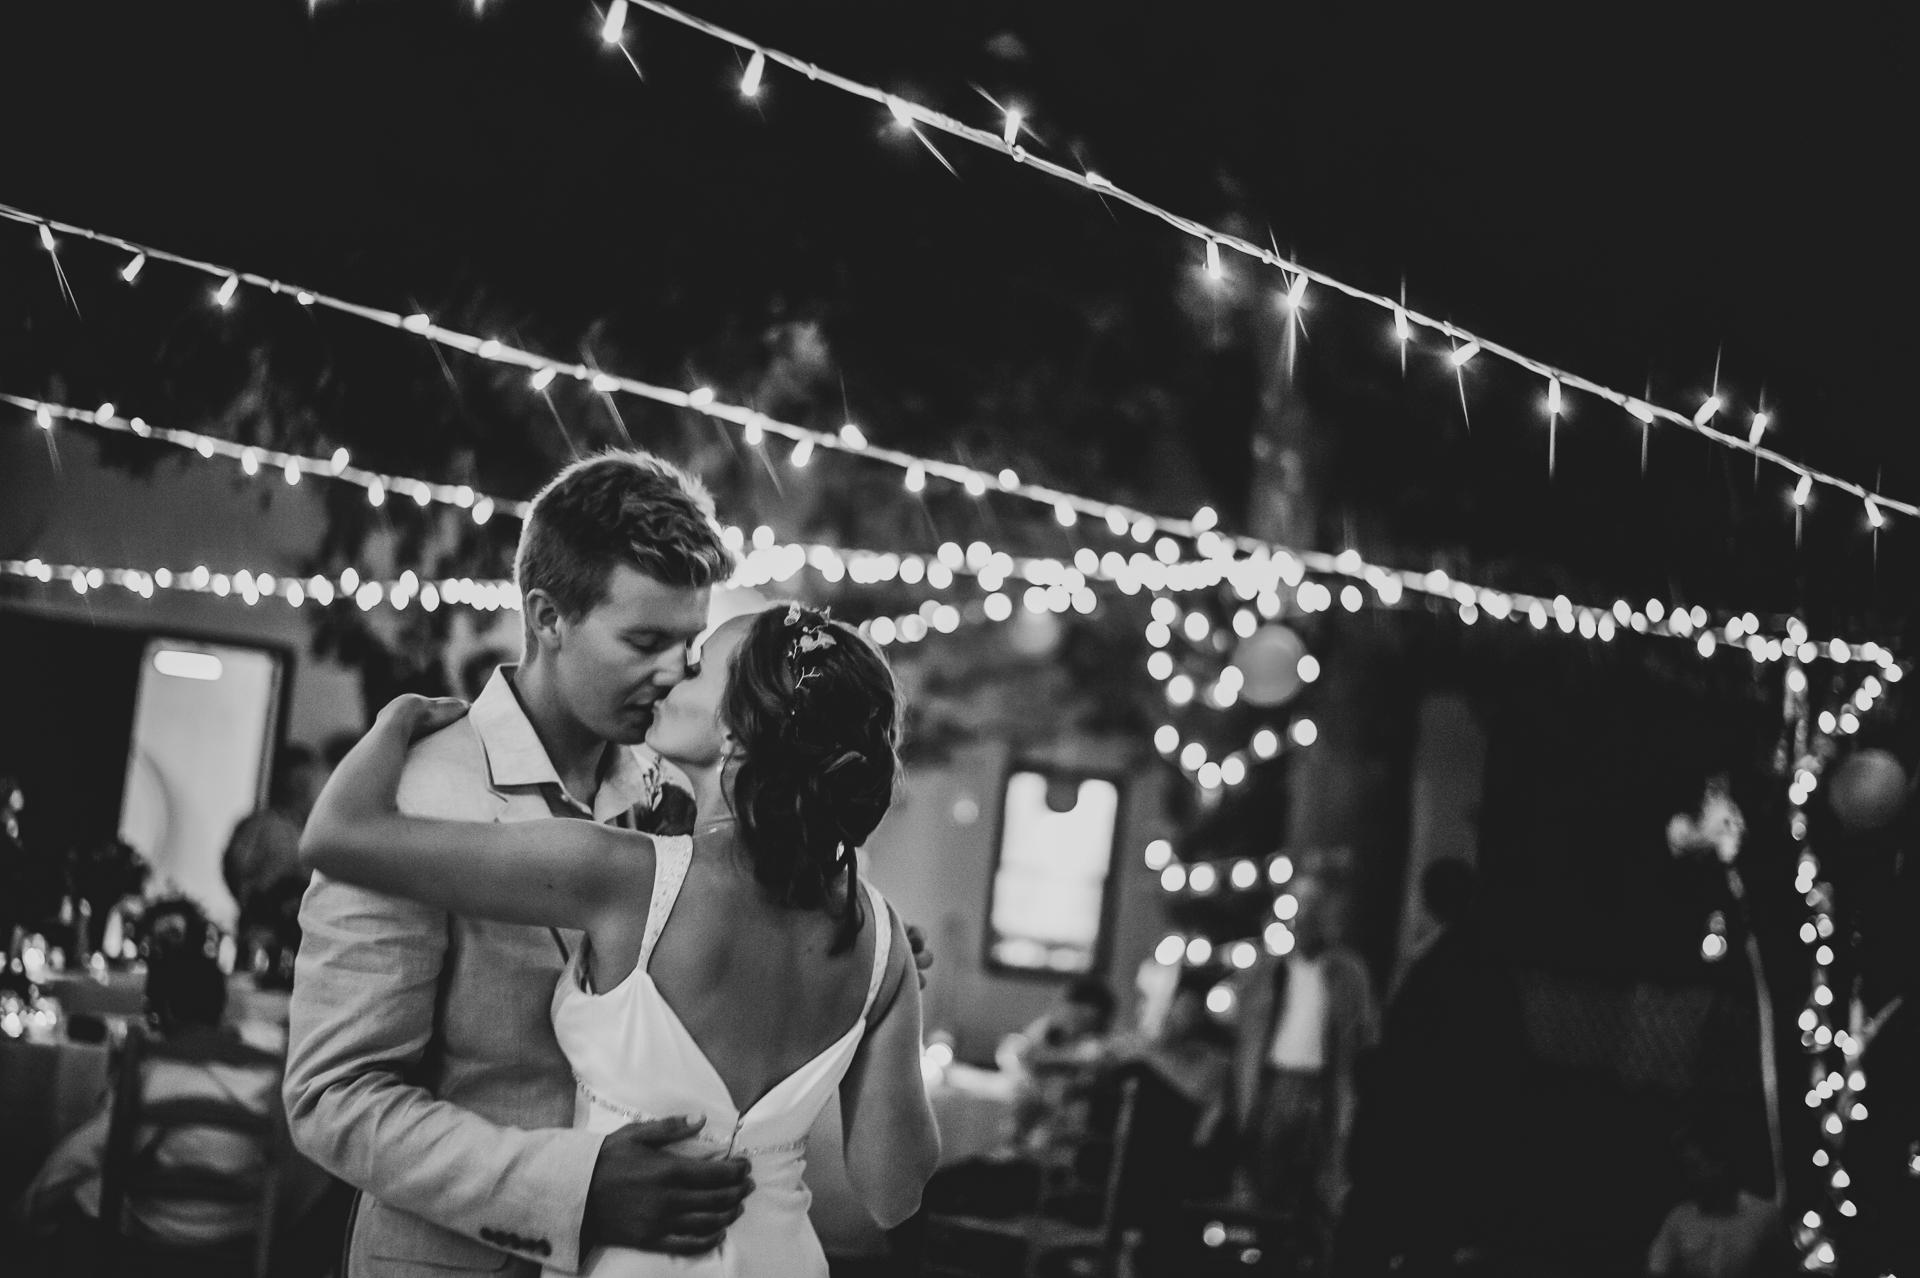 Western Cape, SA Elopement Venue Reception Photos | The bride and groom kiss